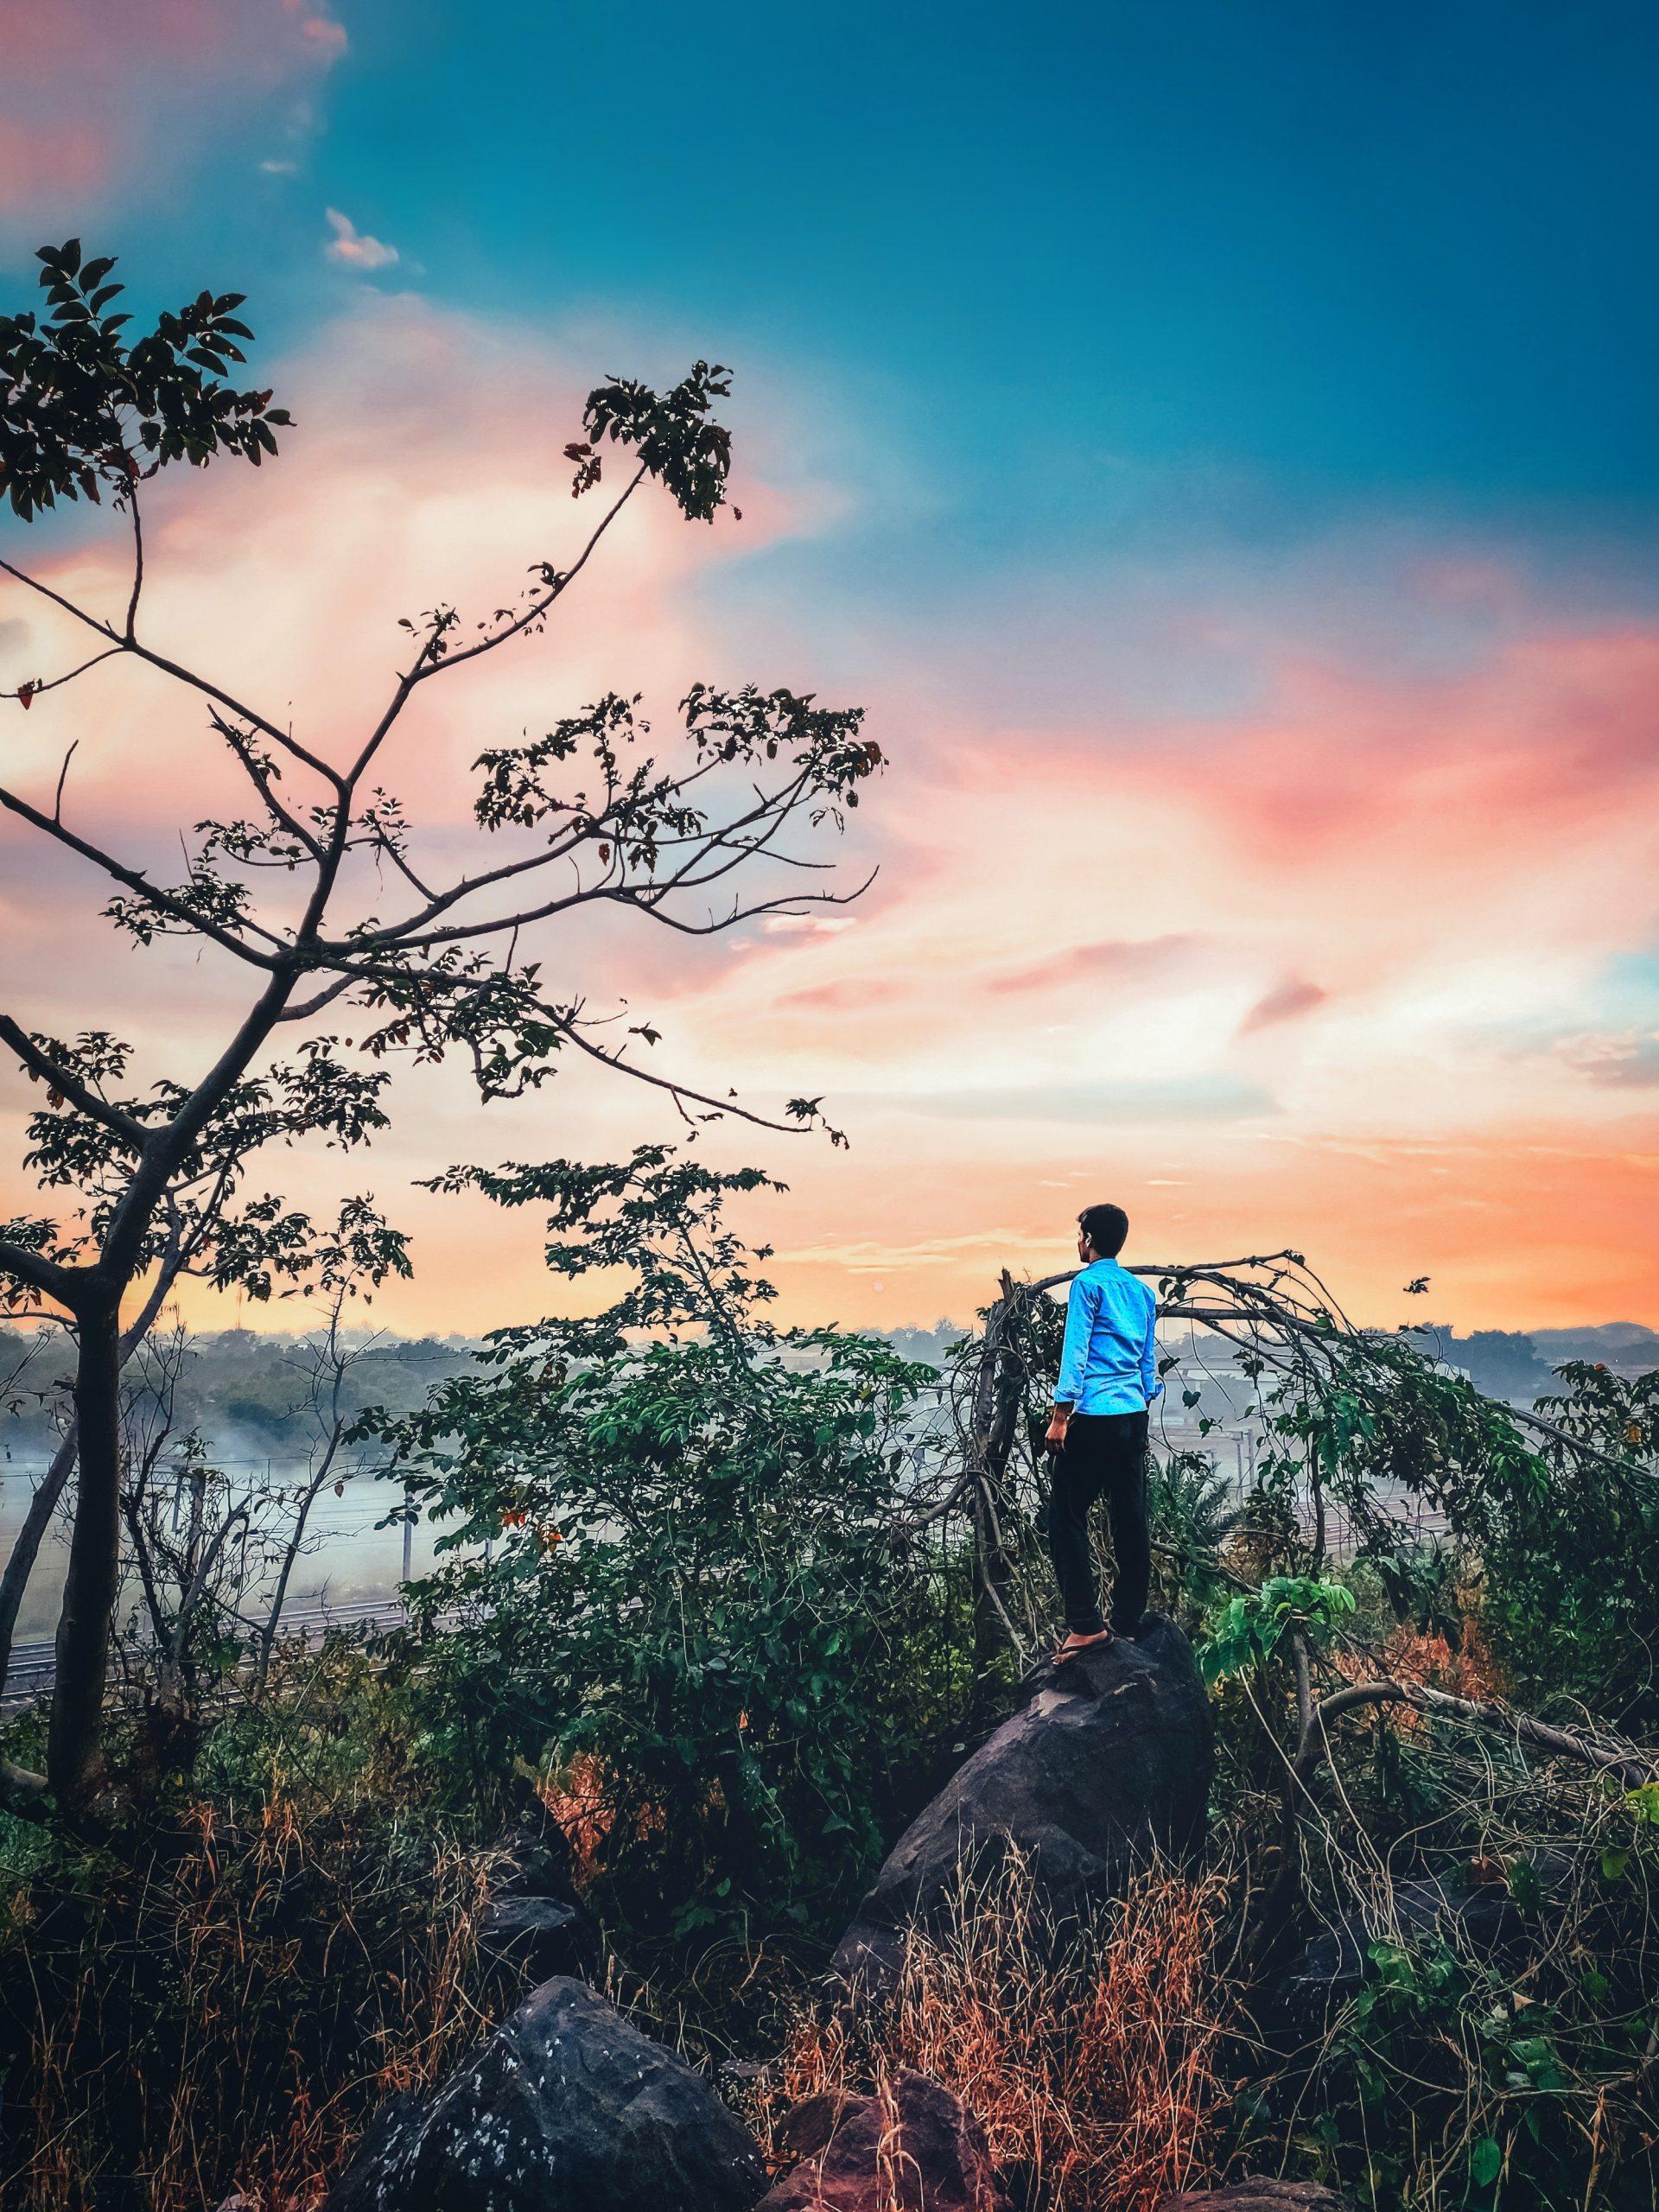 A boy on a hill